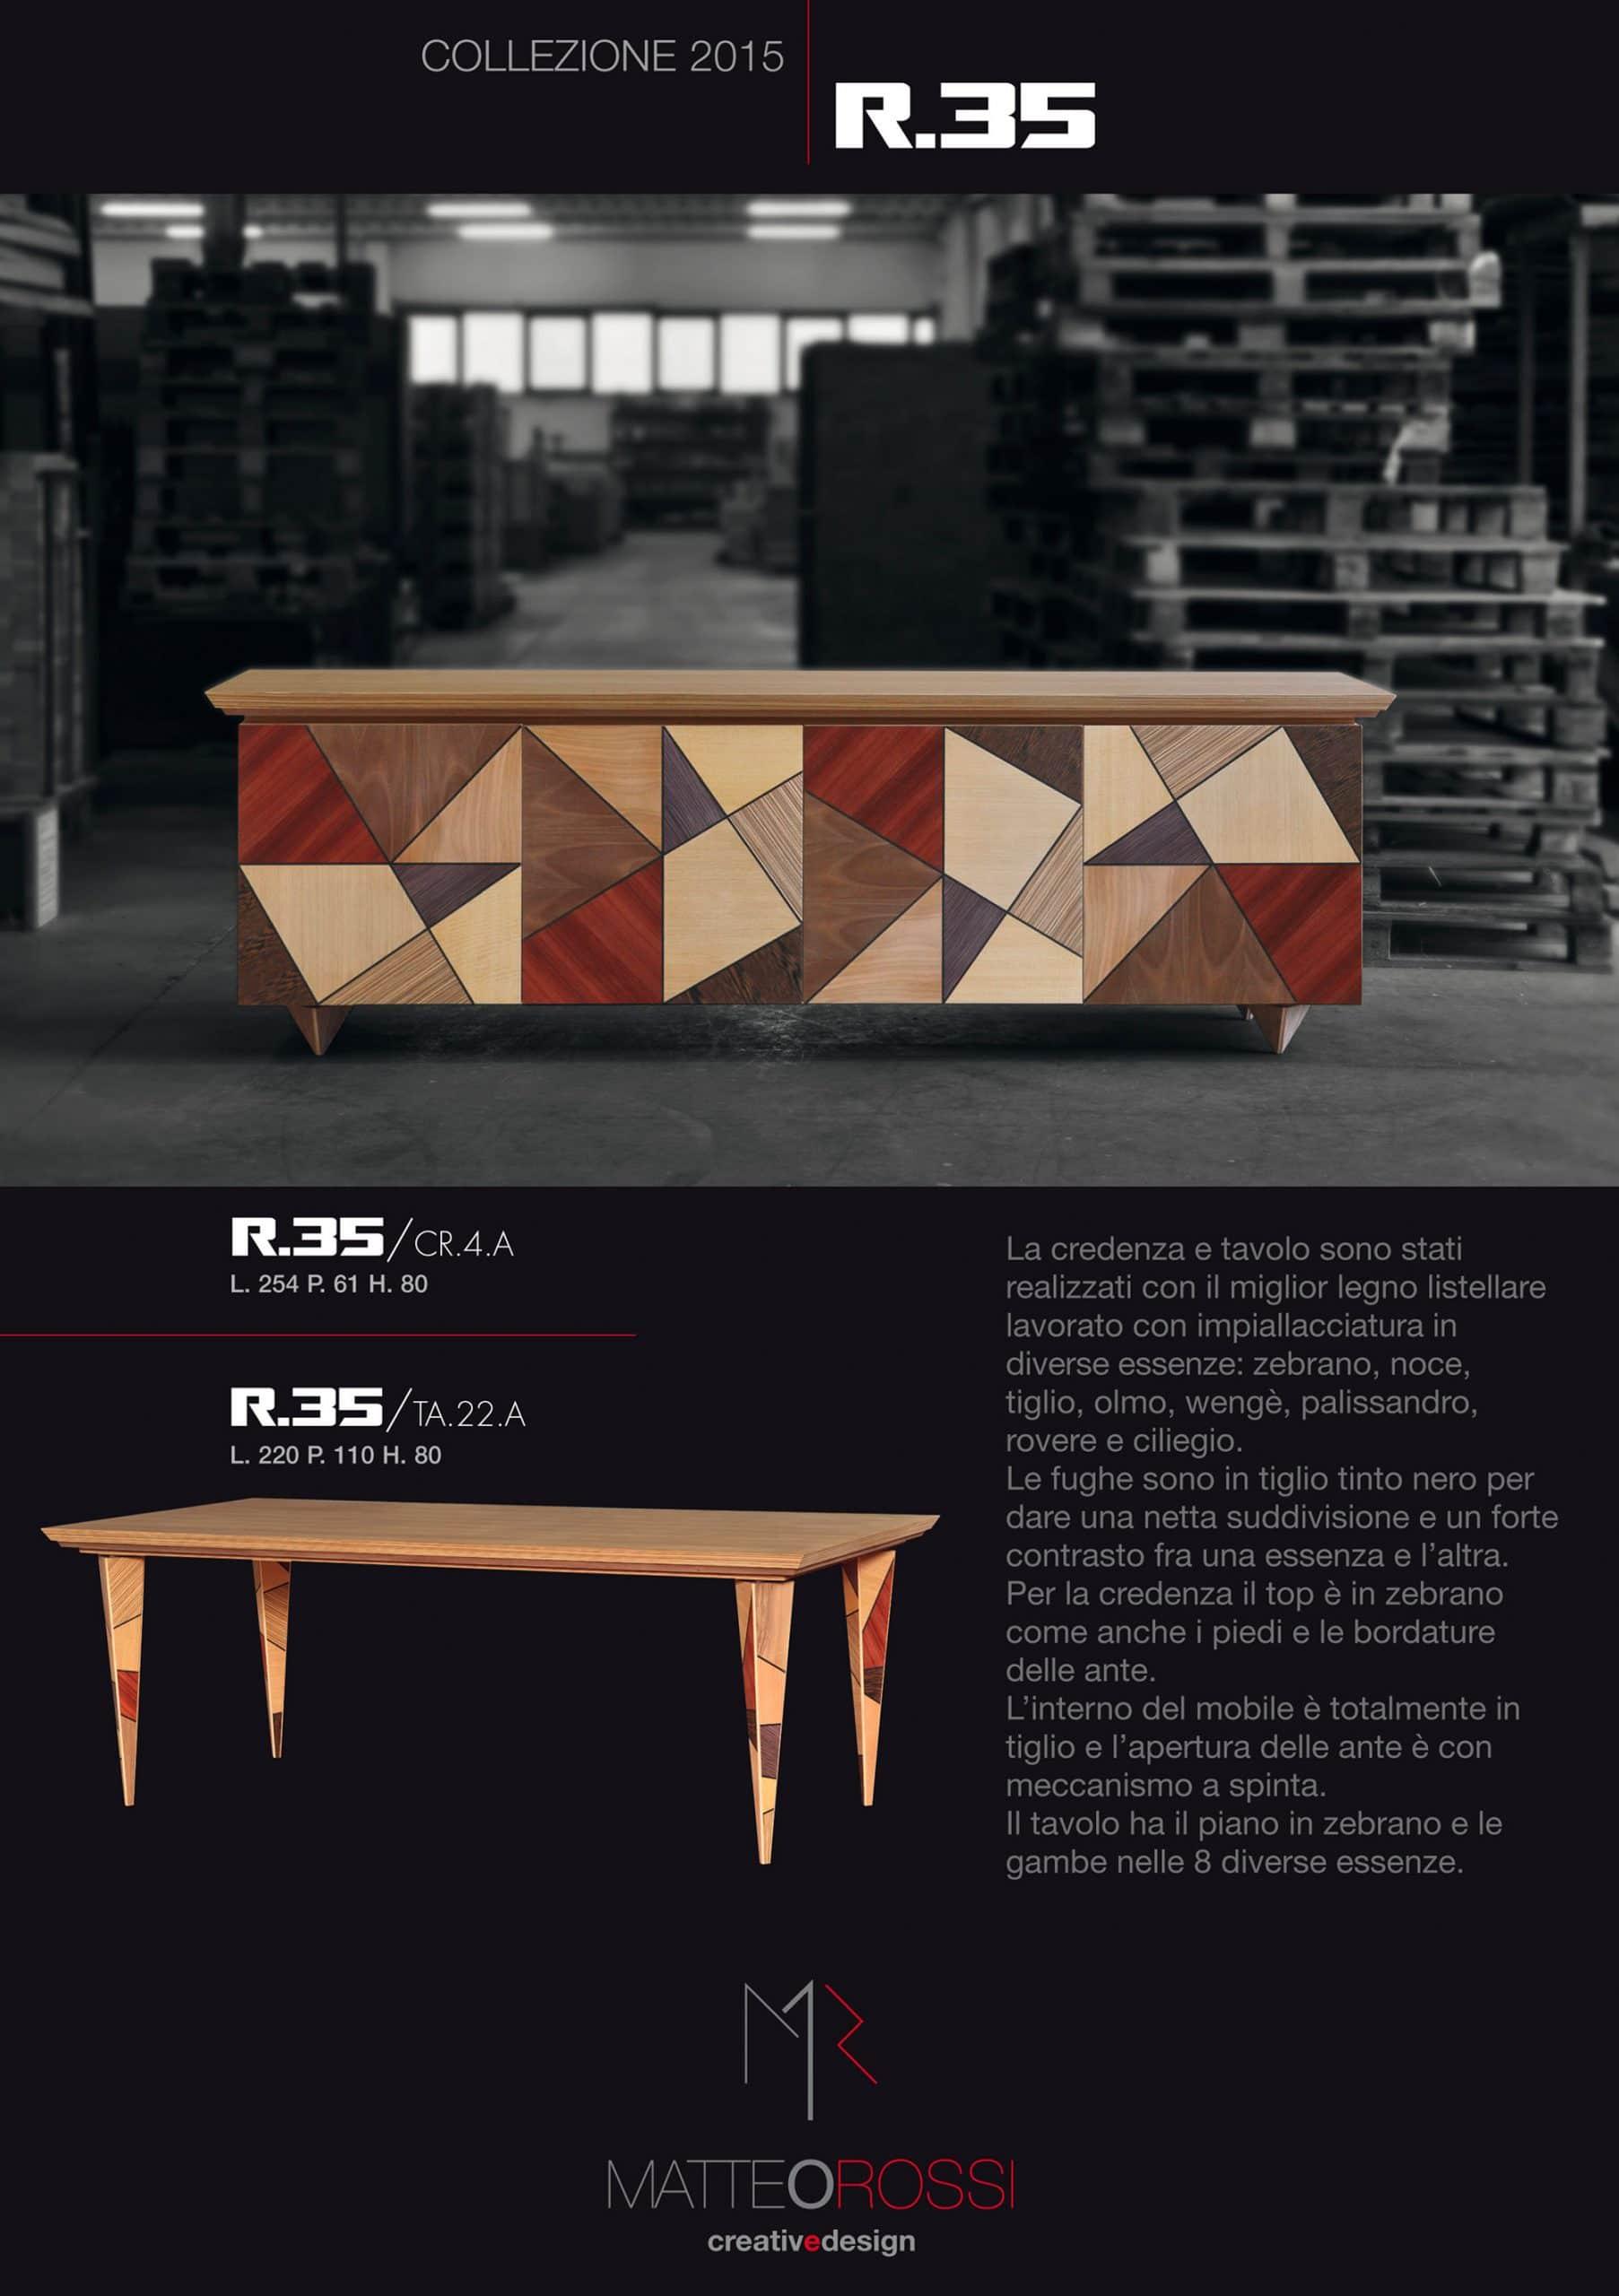 Creazione-design-mobili-k89design-creazione-campagna-pubblicitaria-padova